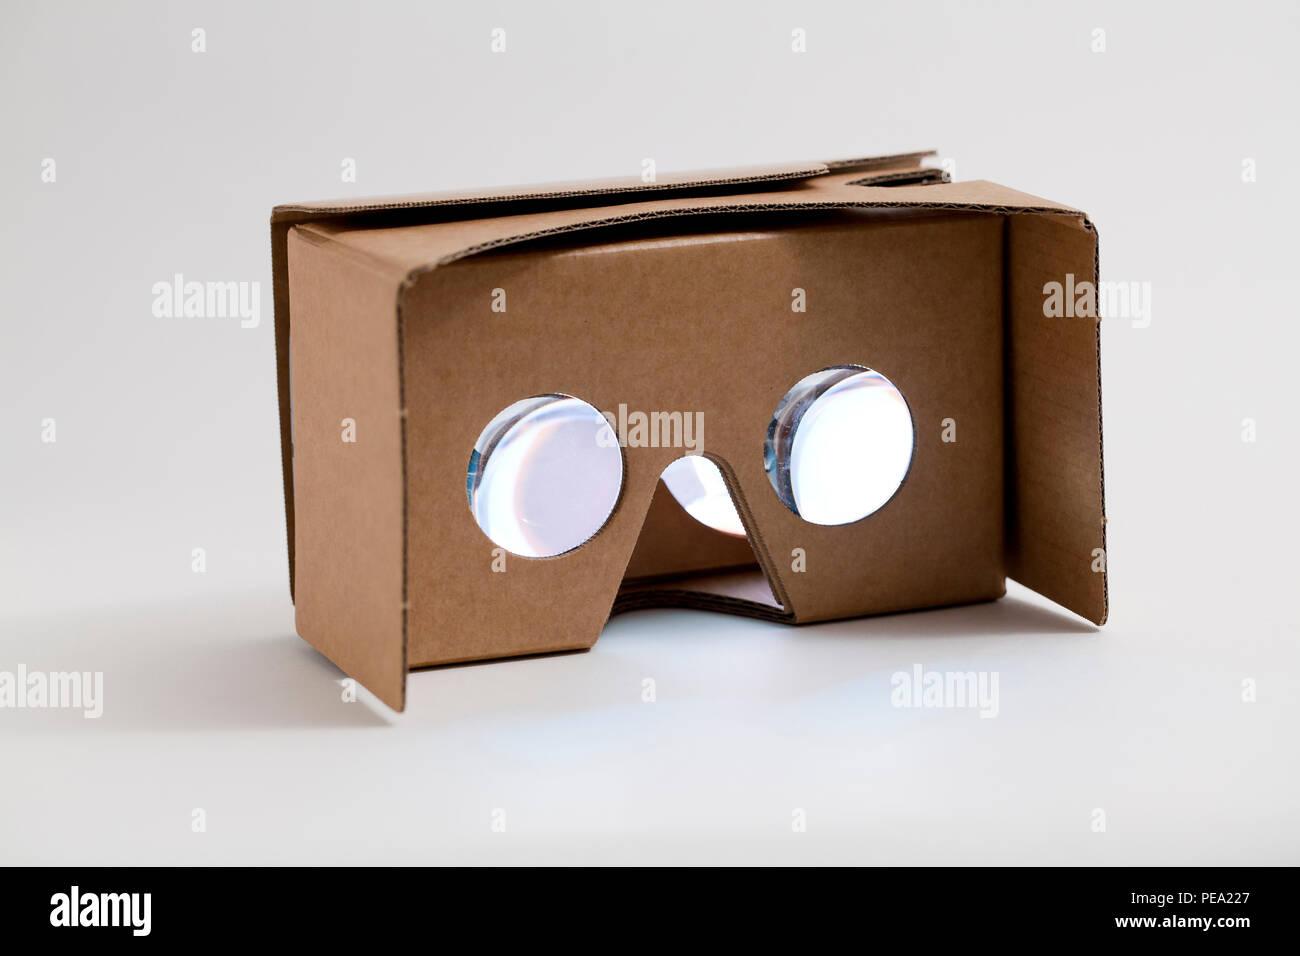 Google Cardboard VR (virtual reality) viewer - USA - Stock Image